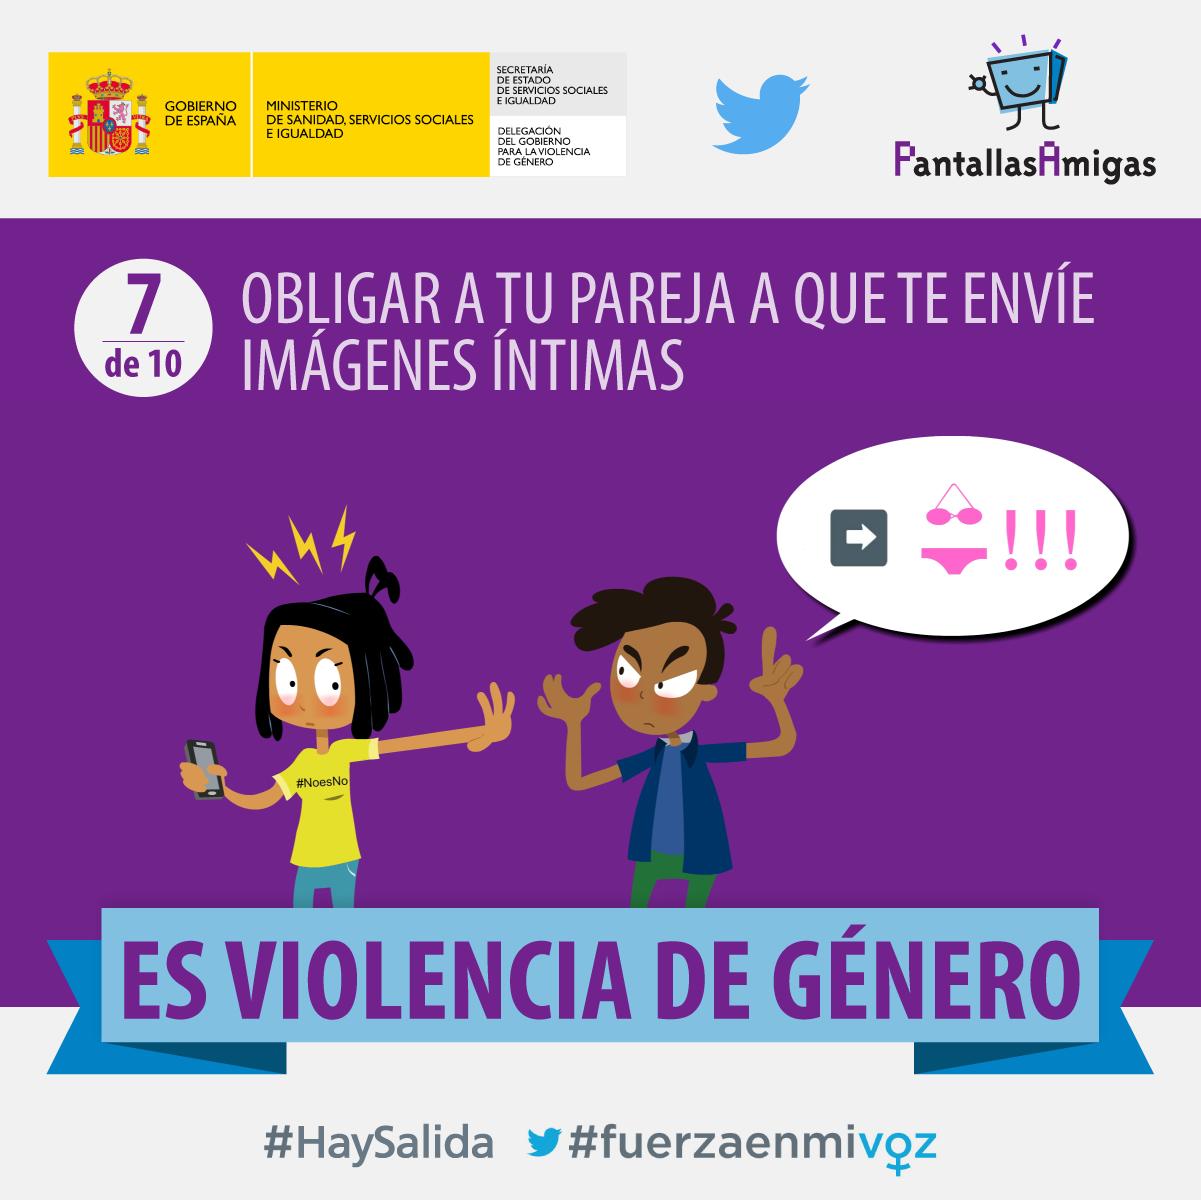 10-FORMAS-VIOLENCIA-DE-GÉNERO-DIGITAL_07_10_Sexting